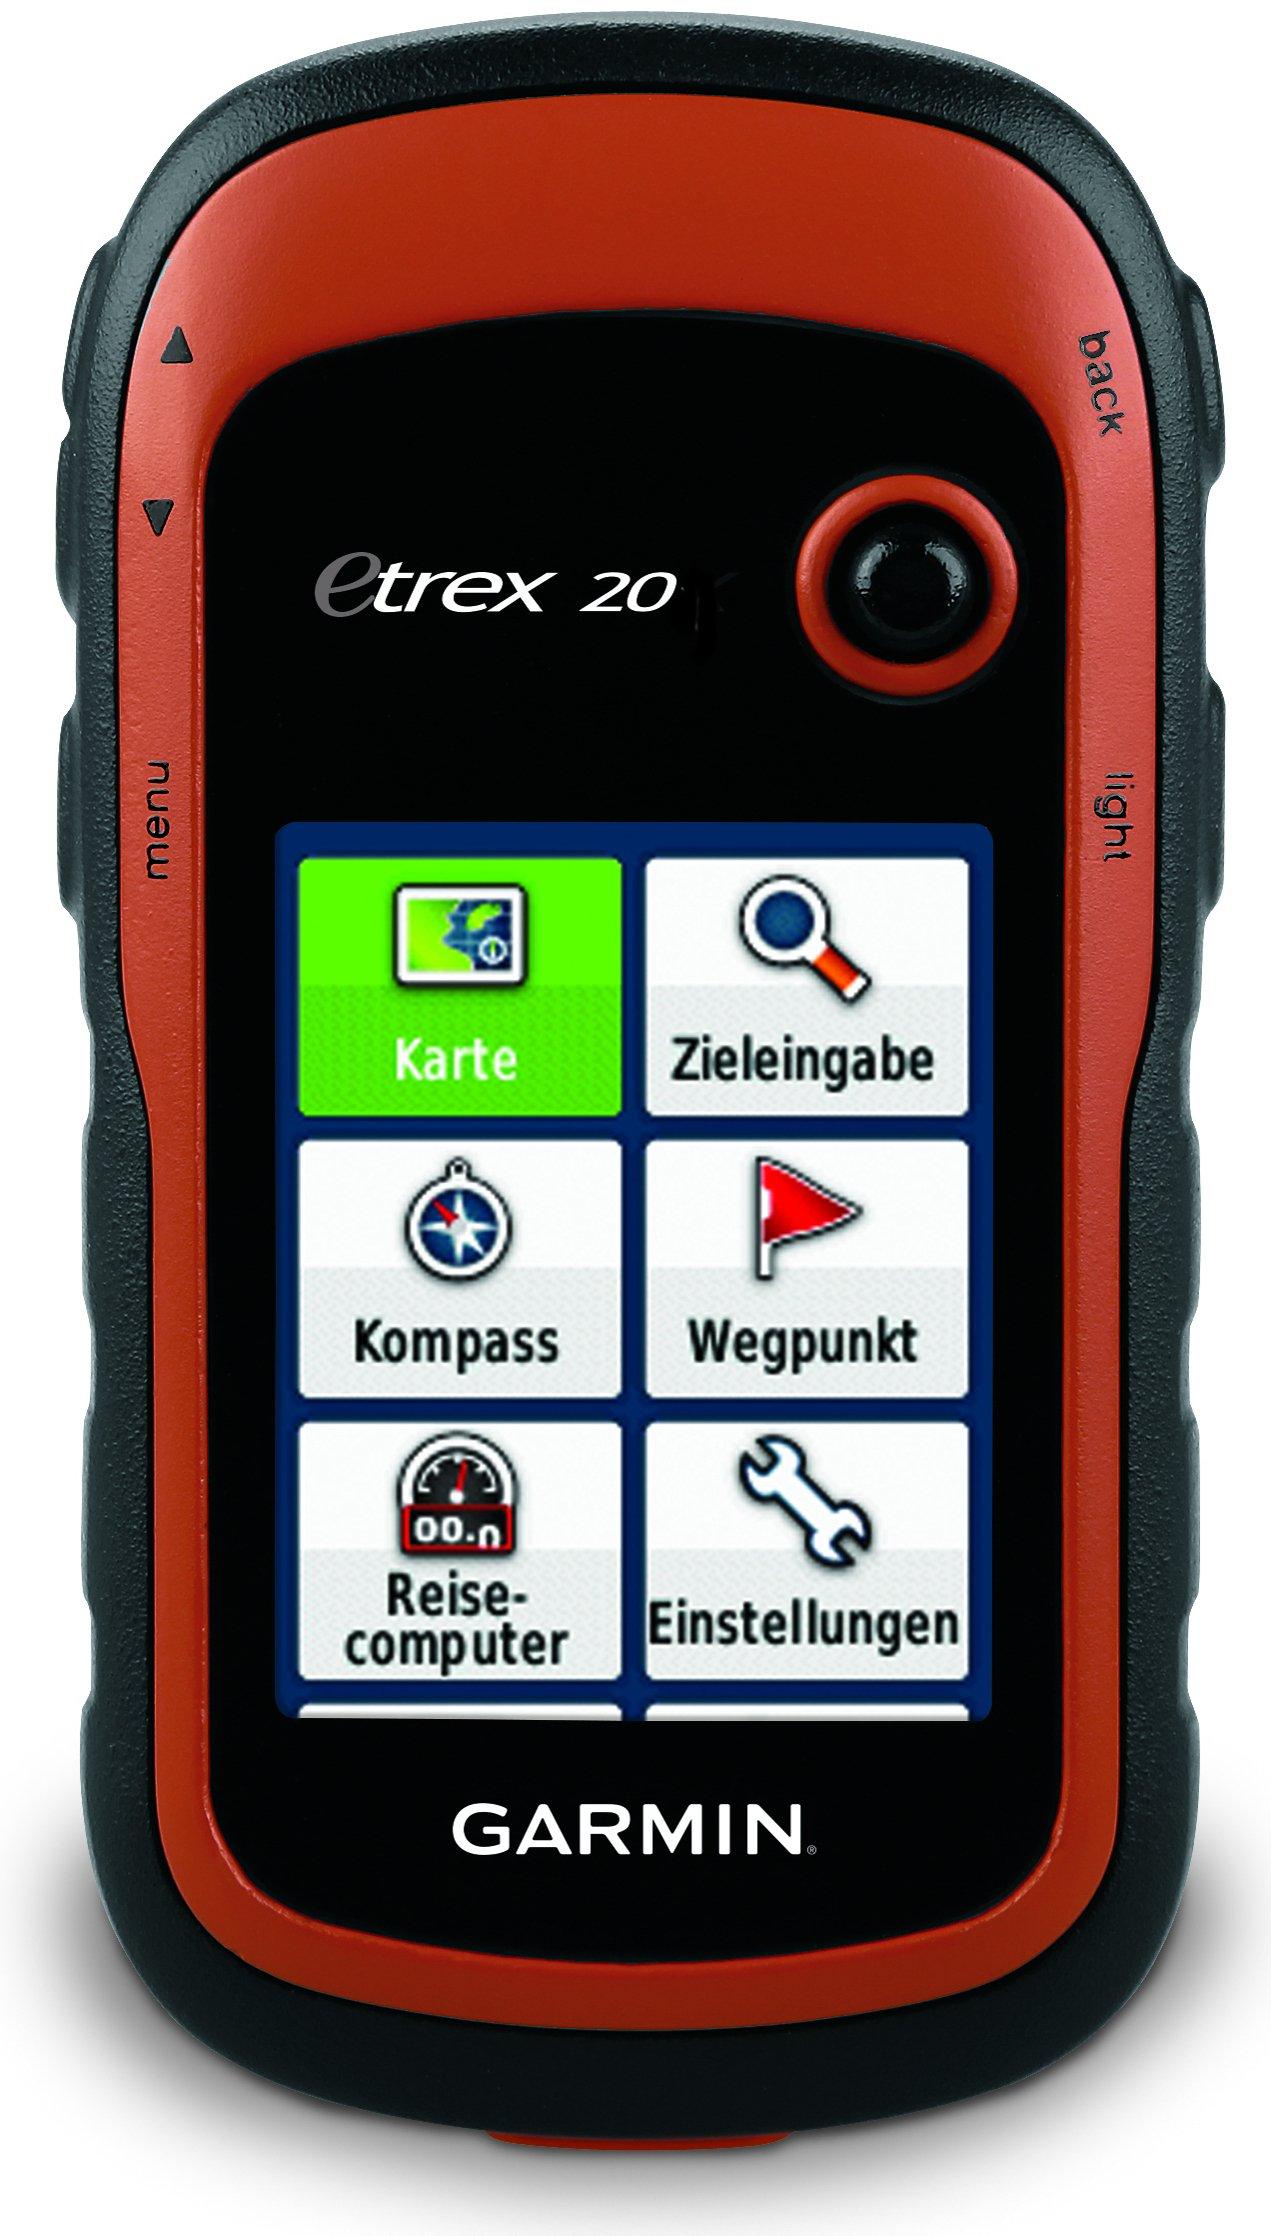 Garmin eTrex 20 GPS Portatile product image